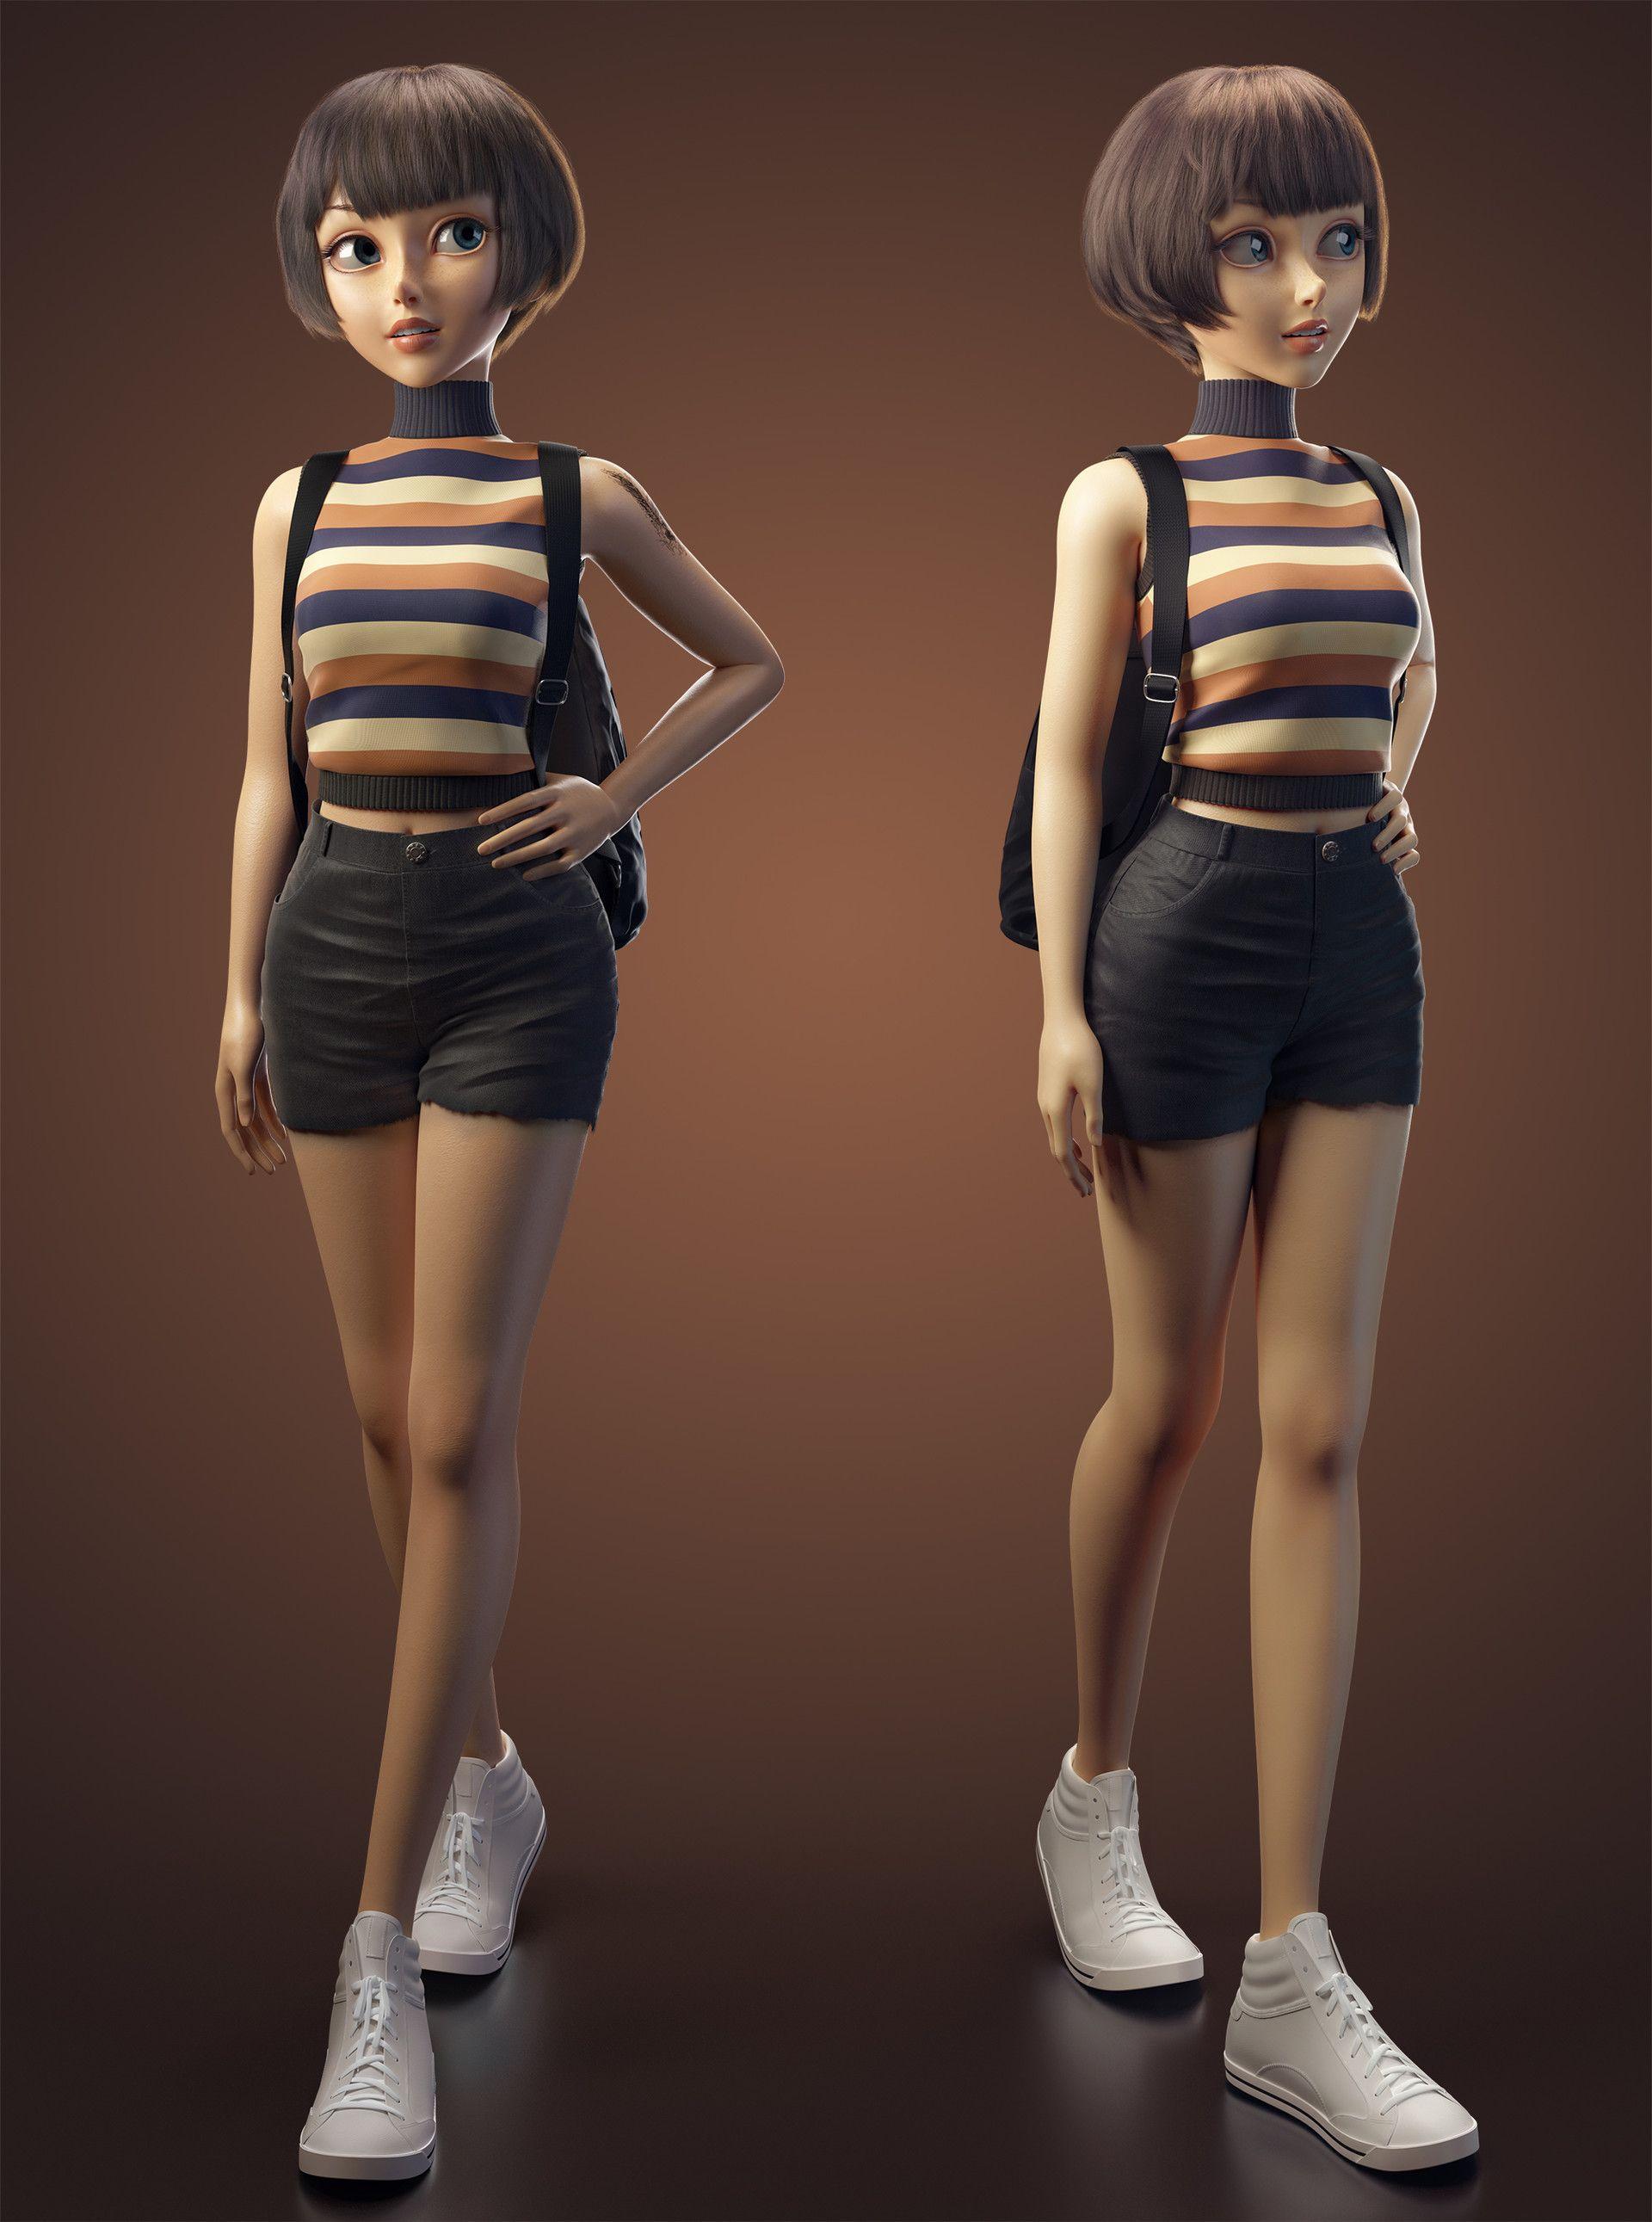 girl by Yuheng Jiang Cartoon 3D CGSociety Girl